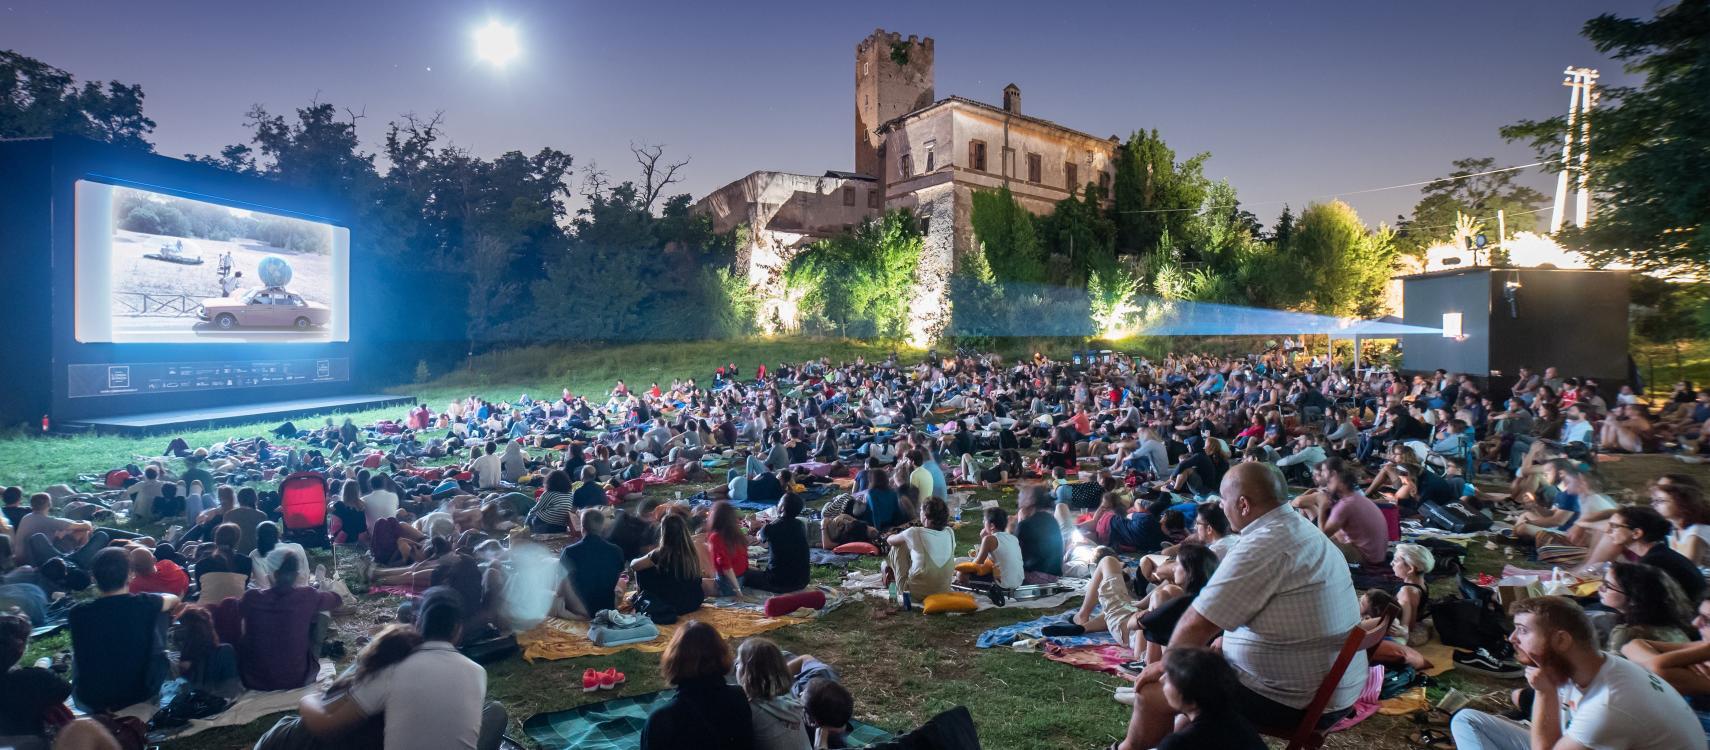 Cinema in Piazza